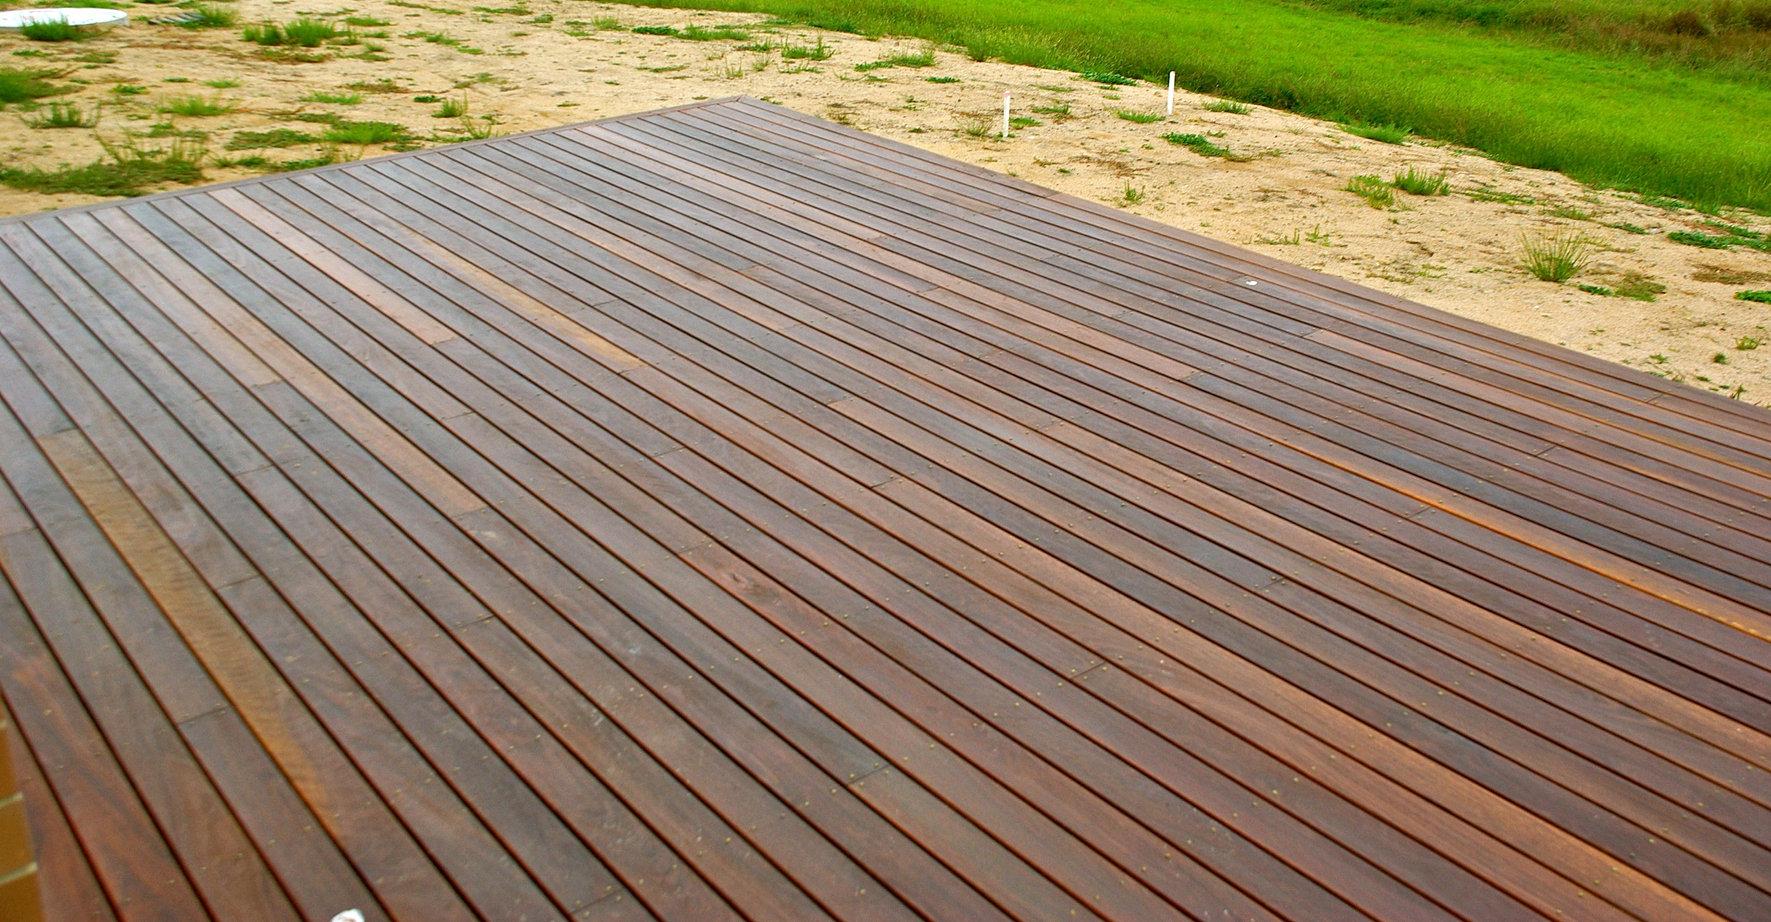 North eden timber australian hardwood decking timber for Australian hardwood decking